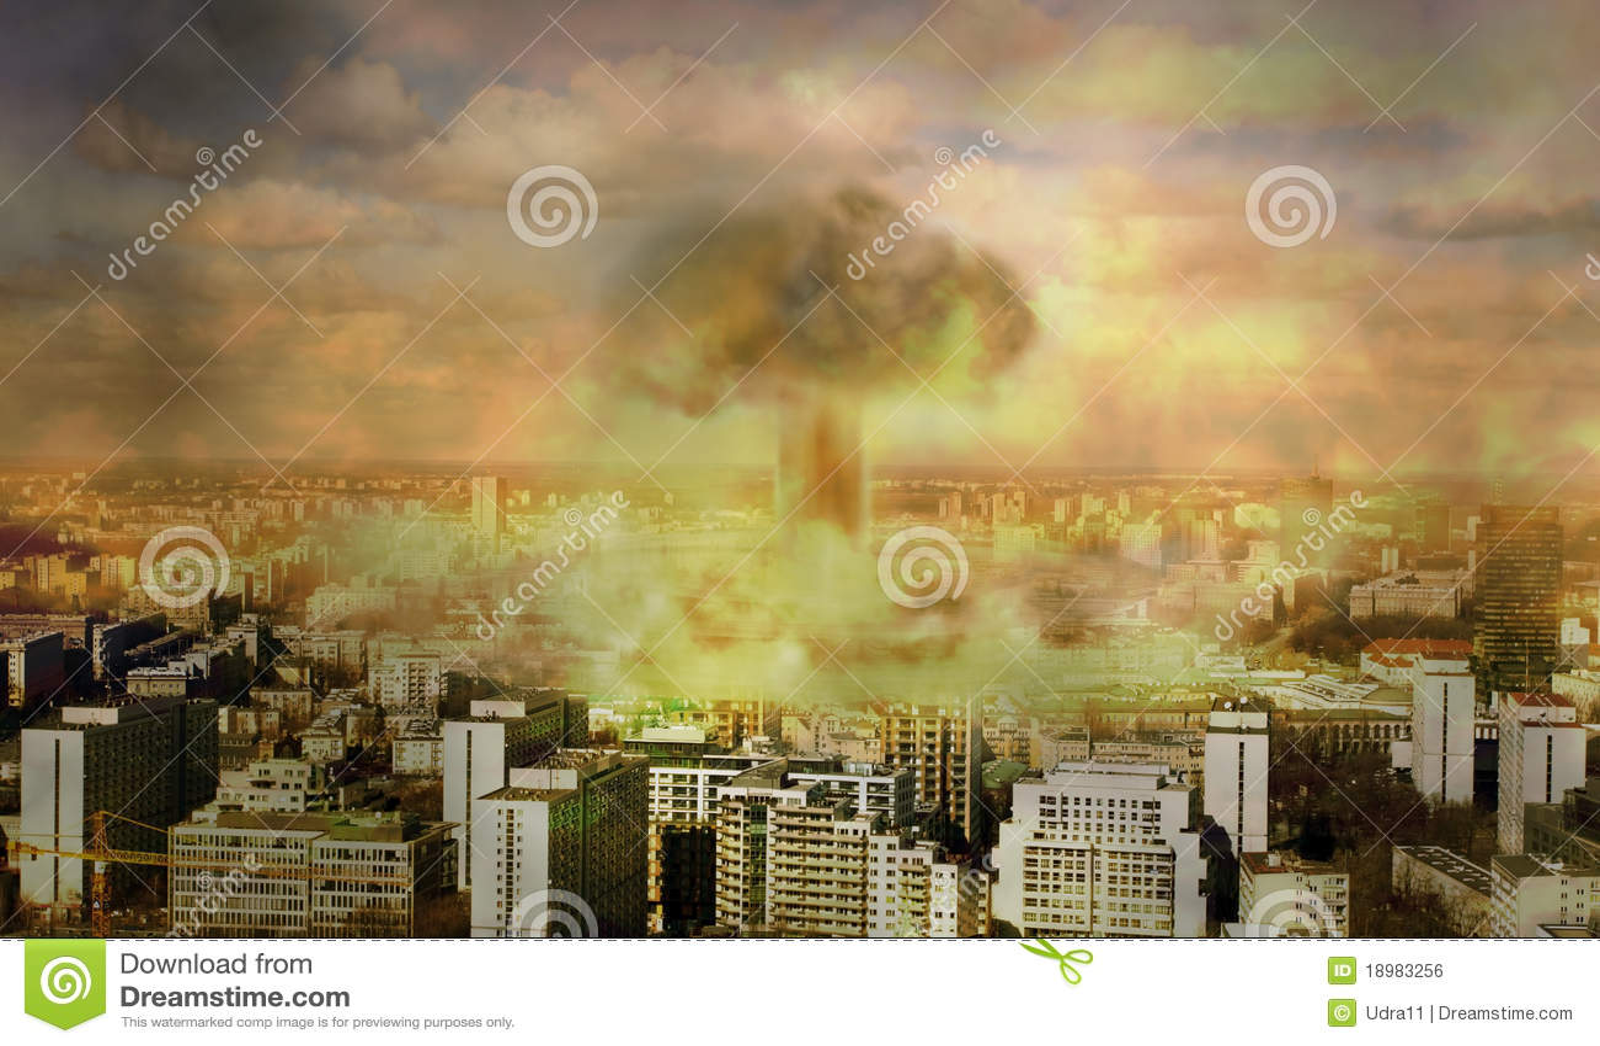 Apocalipse, bomba nuclear